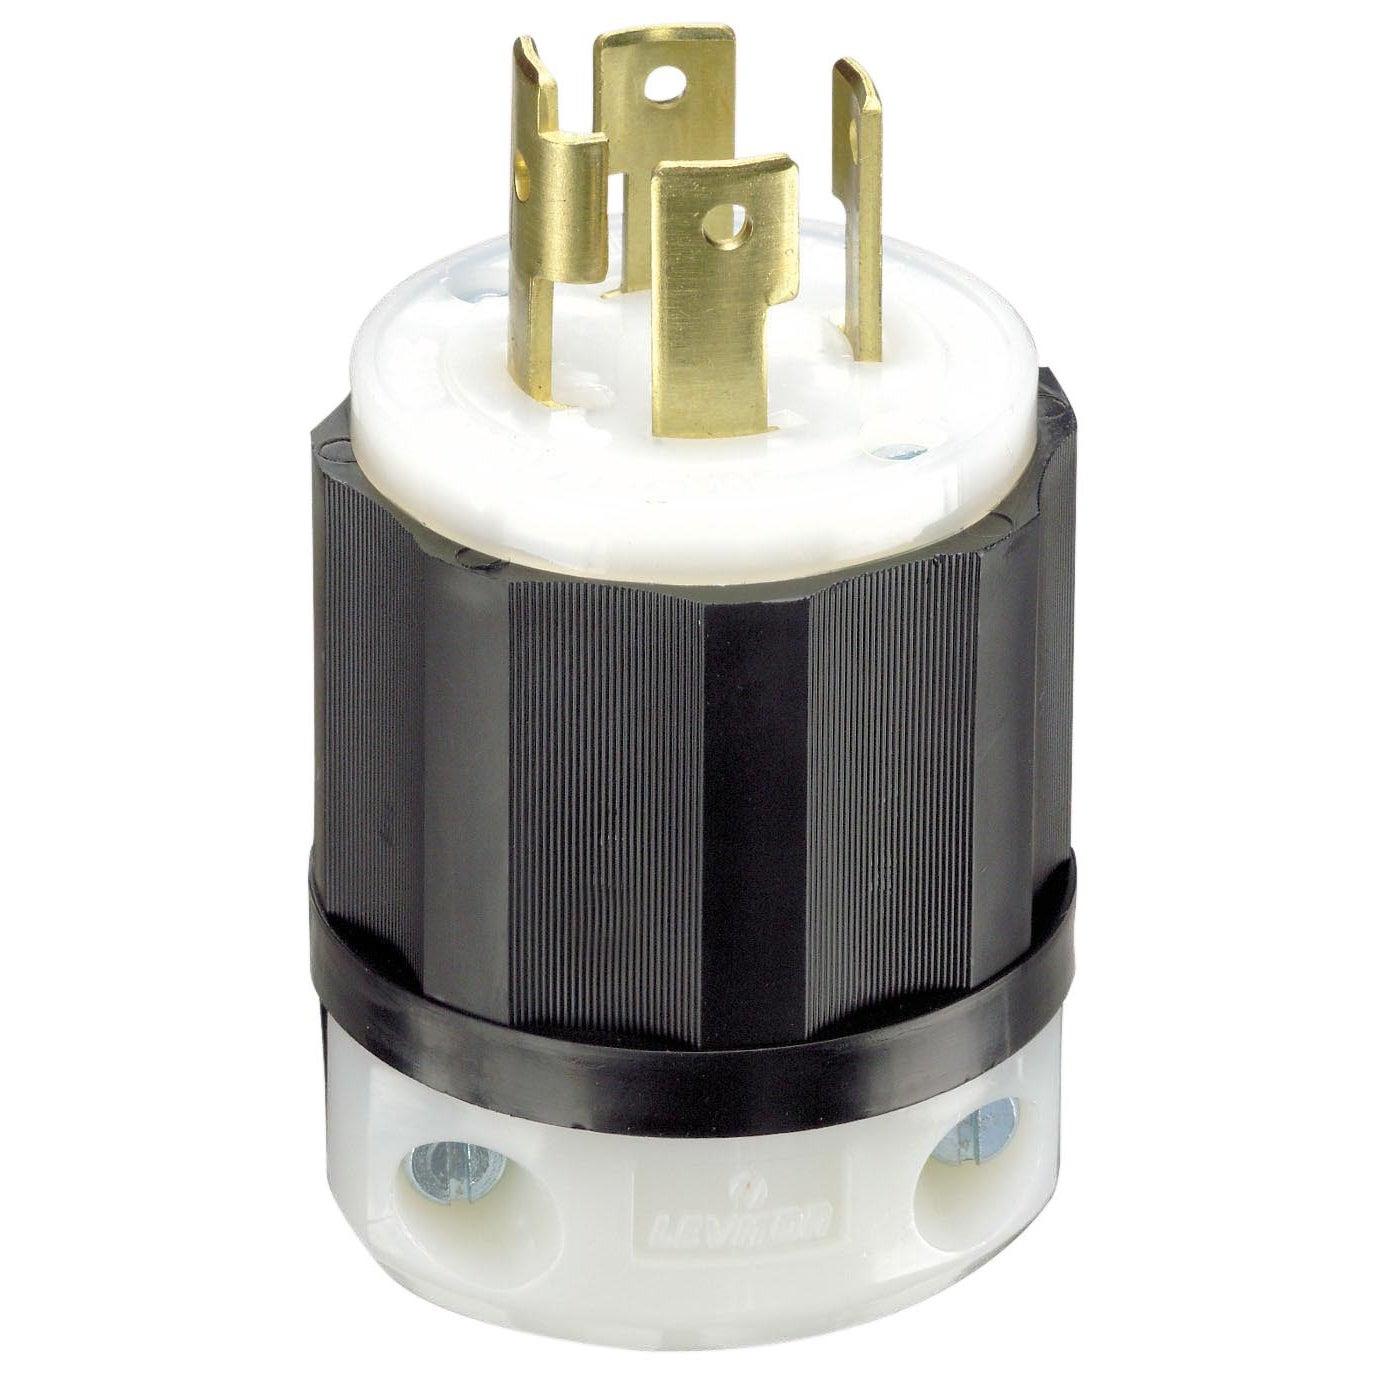 Leviton 061-2711 30 Amp 4W, 3P Nema L14-30P Locking Plug ...